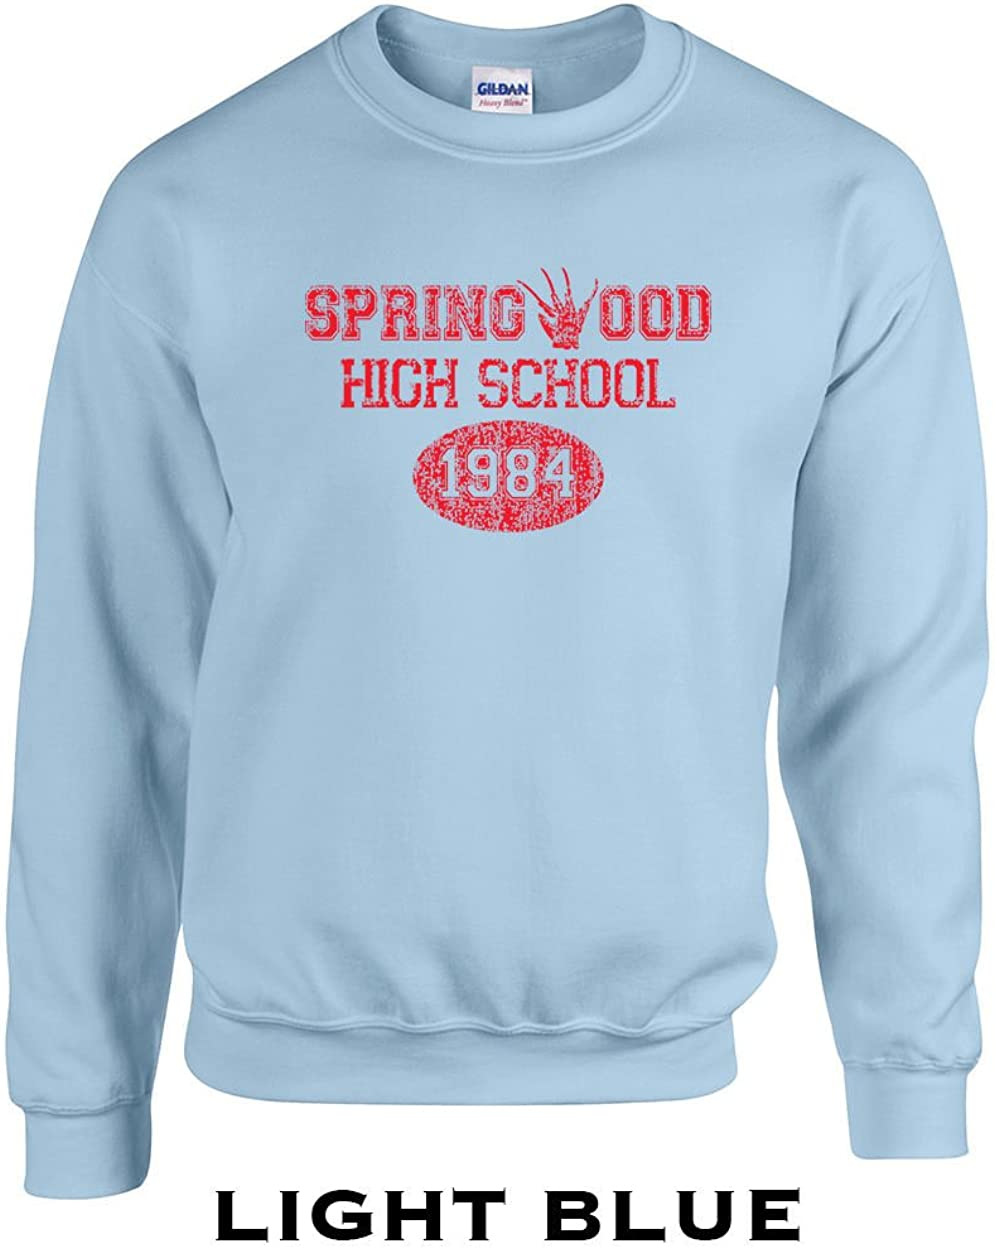 Swaffy Tees 356 Springwood High School Funny Adult Crew Sweatshirt